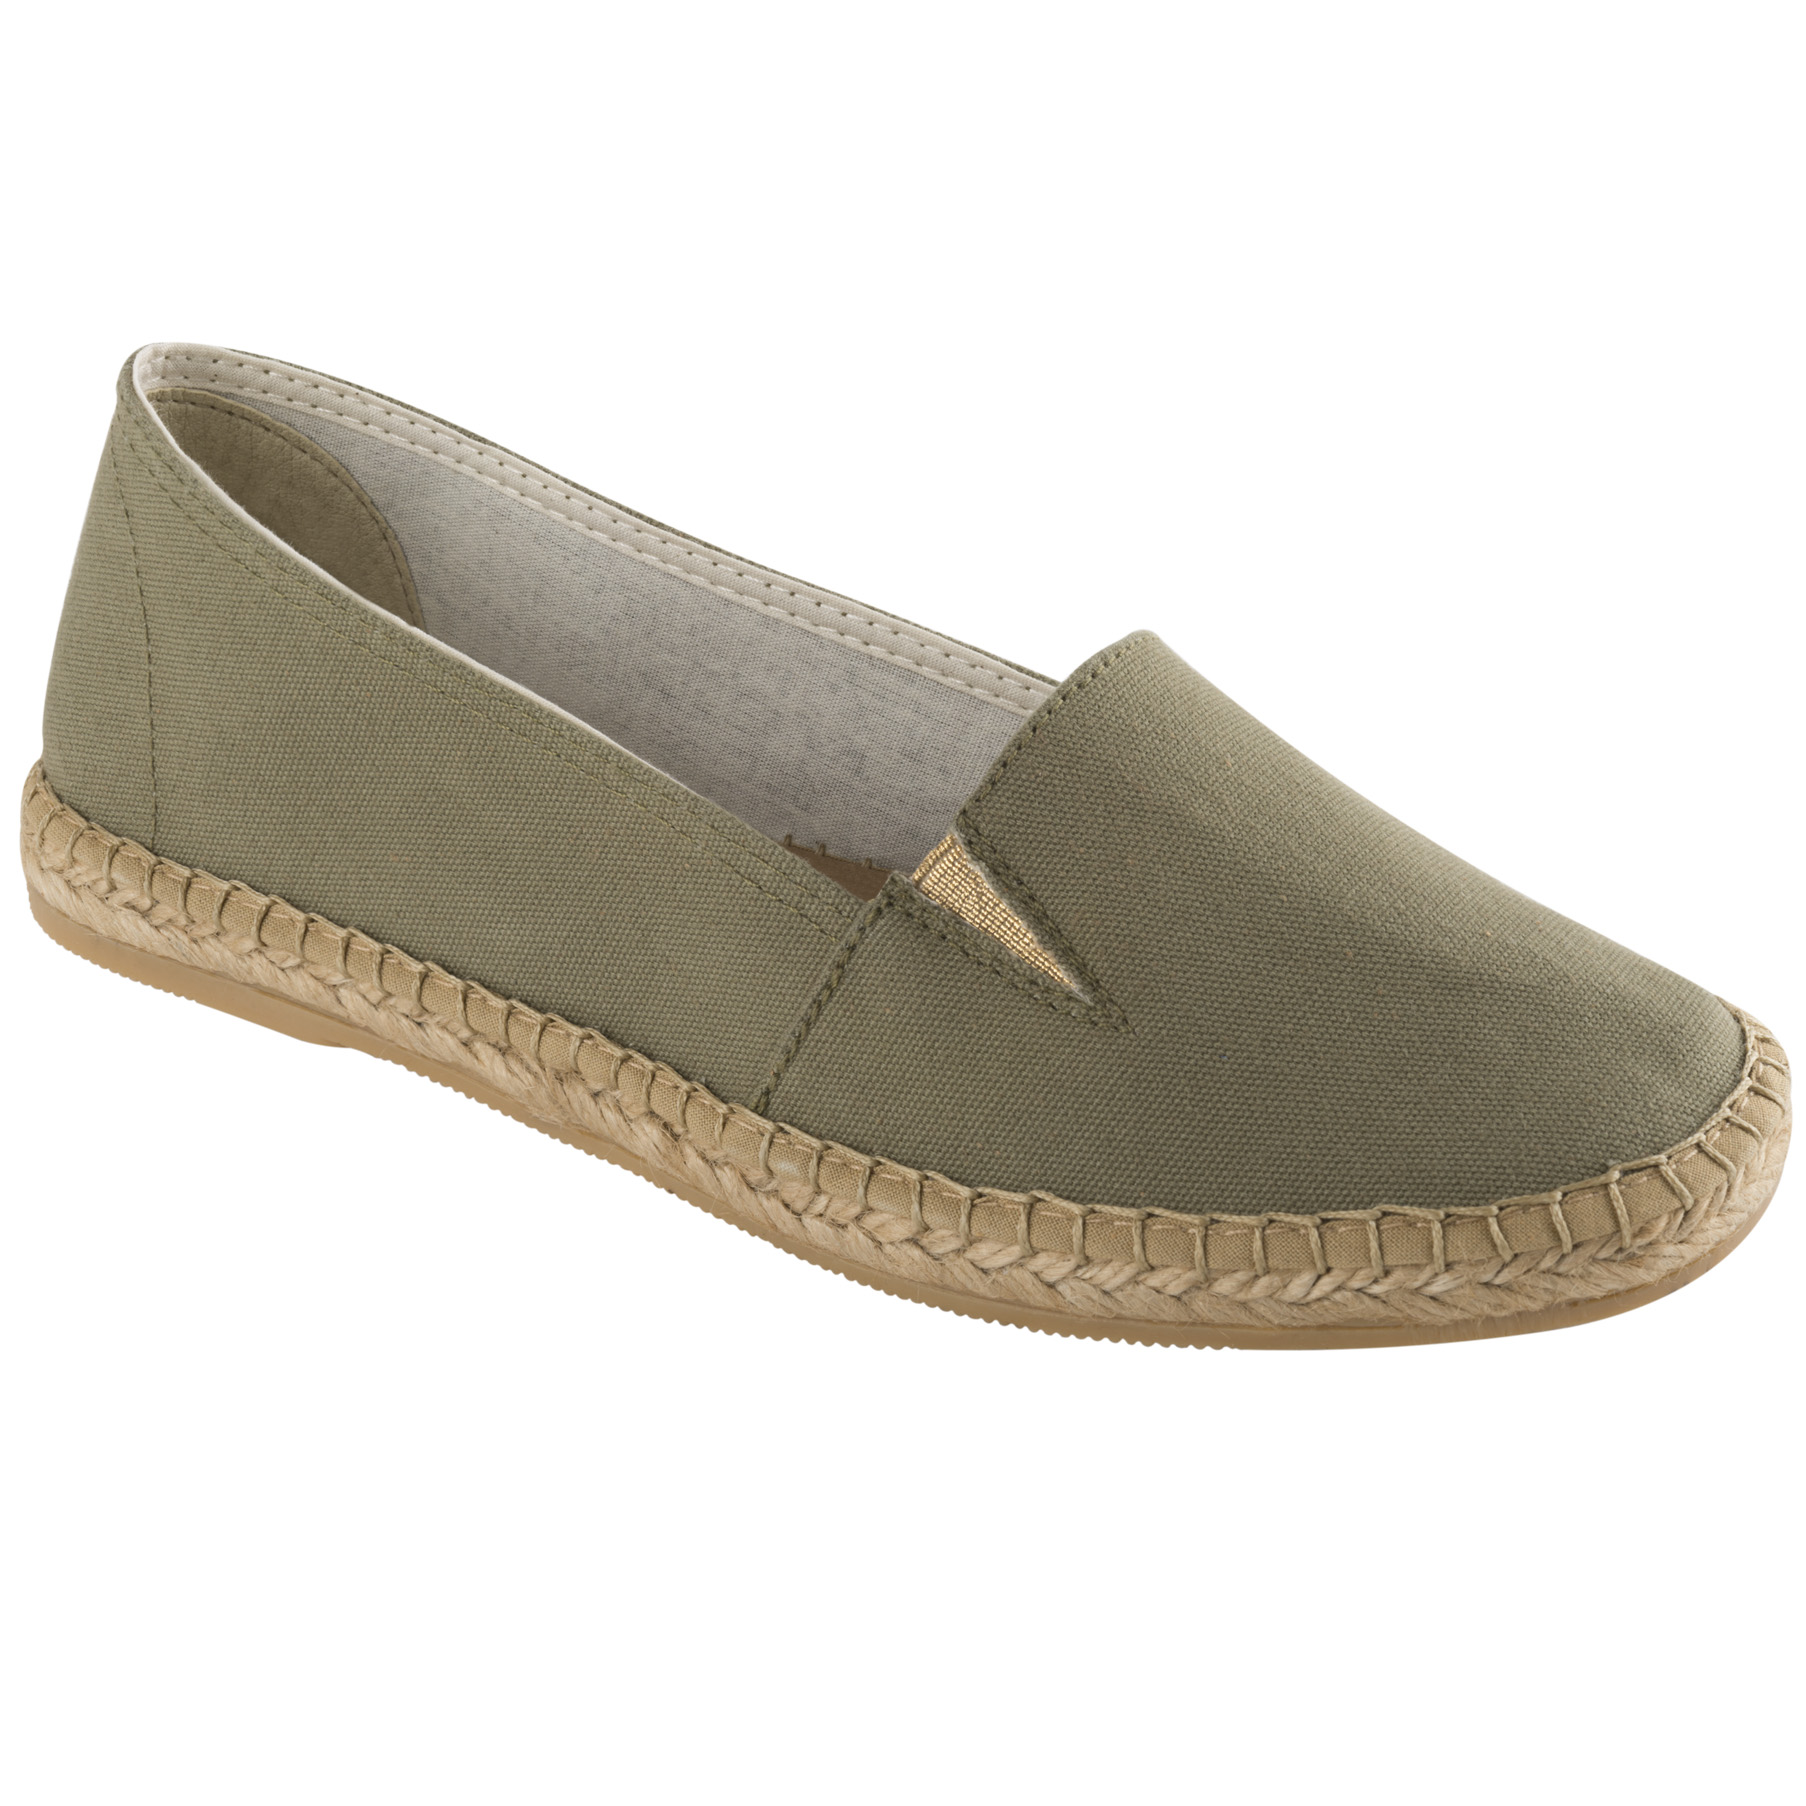 fe8c38d55a9 Γυναικεία Ανατομικά Παπούτσια Dr Scholl Shoes - Pharmaweb.gr